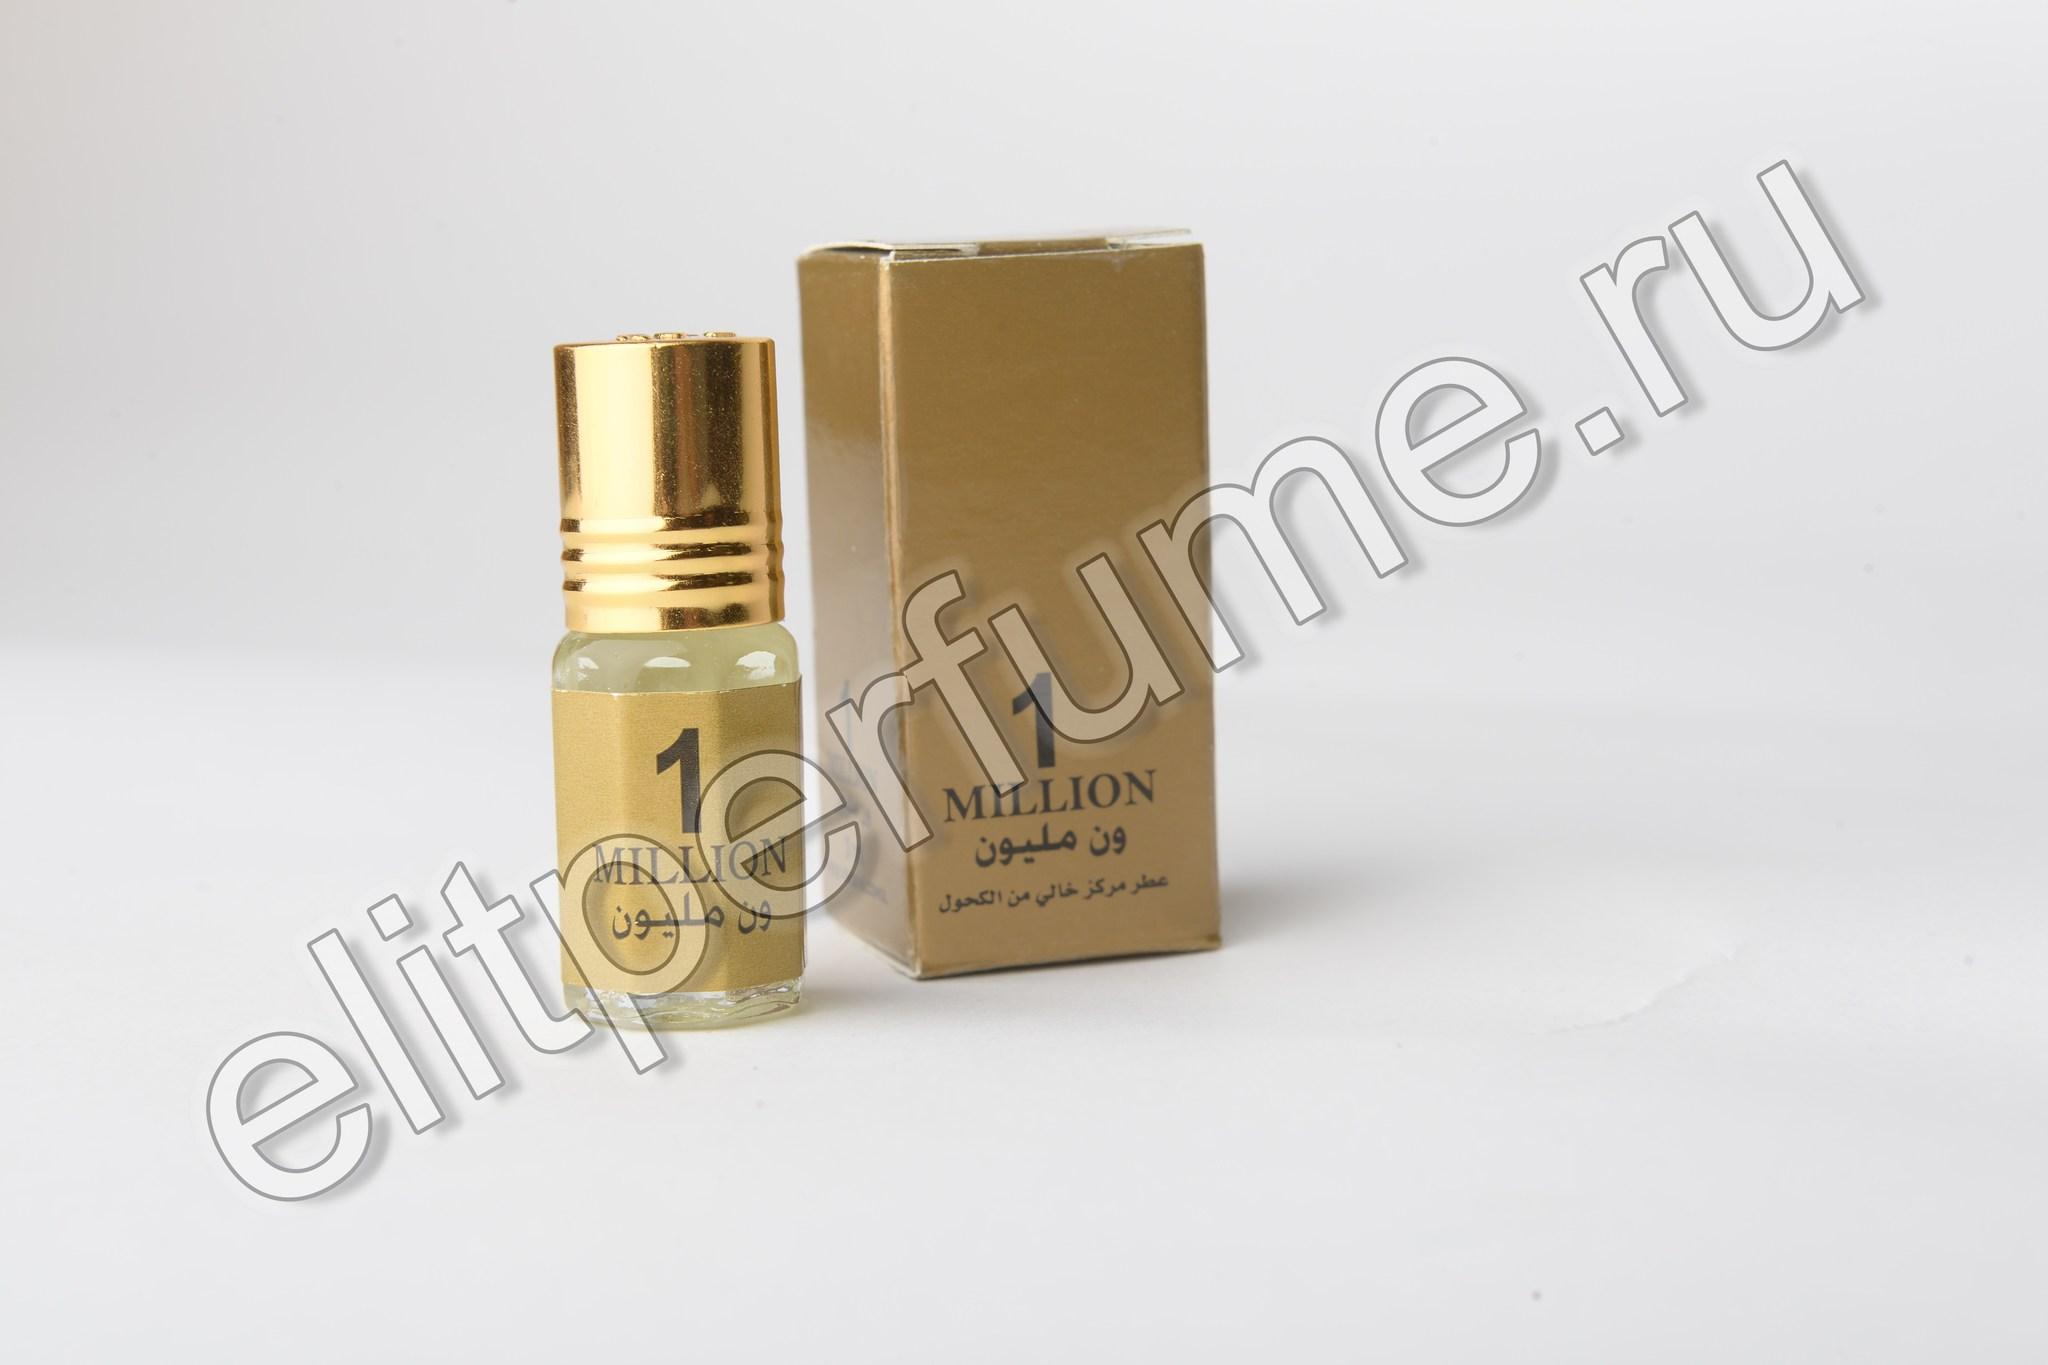 1 Million 3 мл арабские масляные духи от Захра Zahra Perfumes